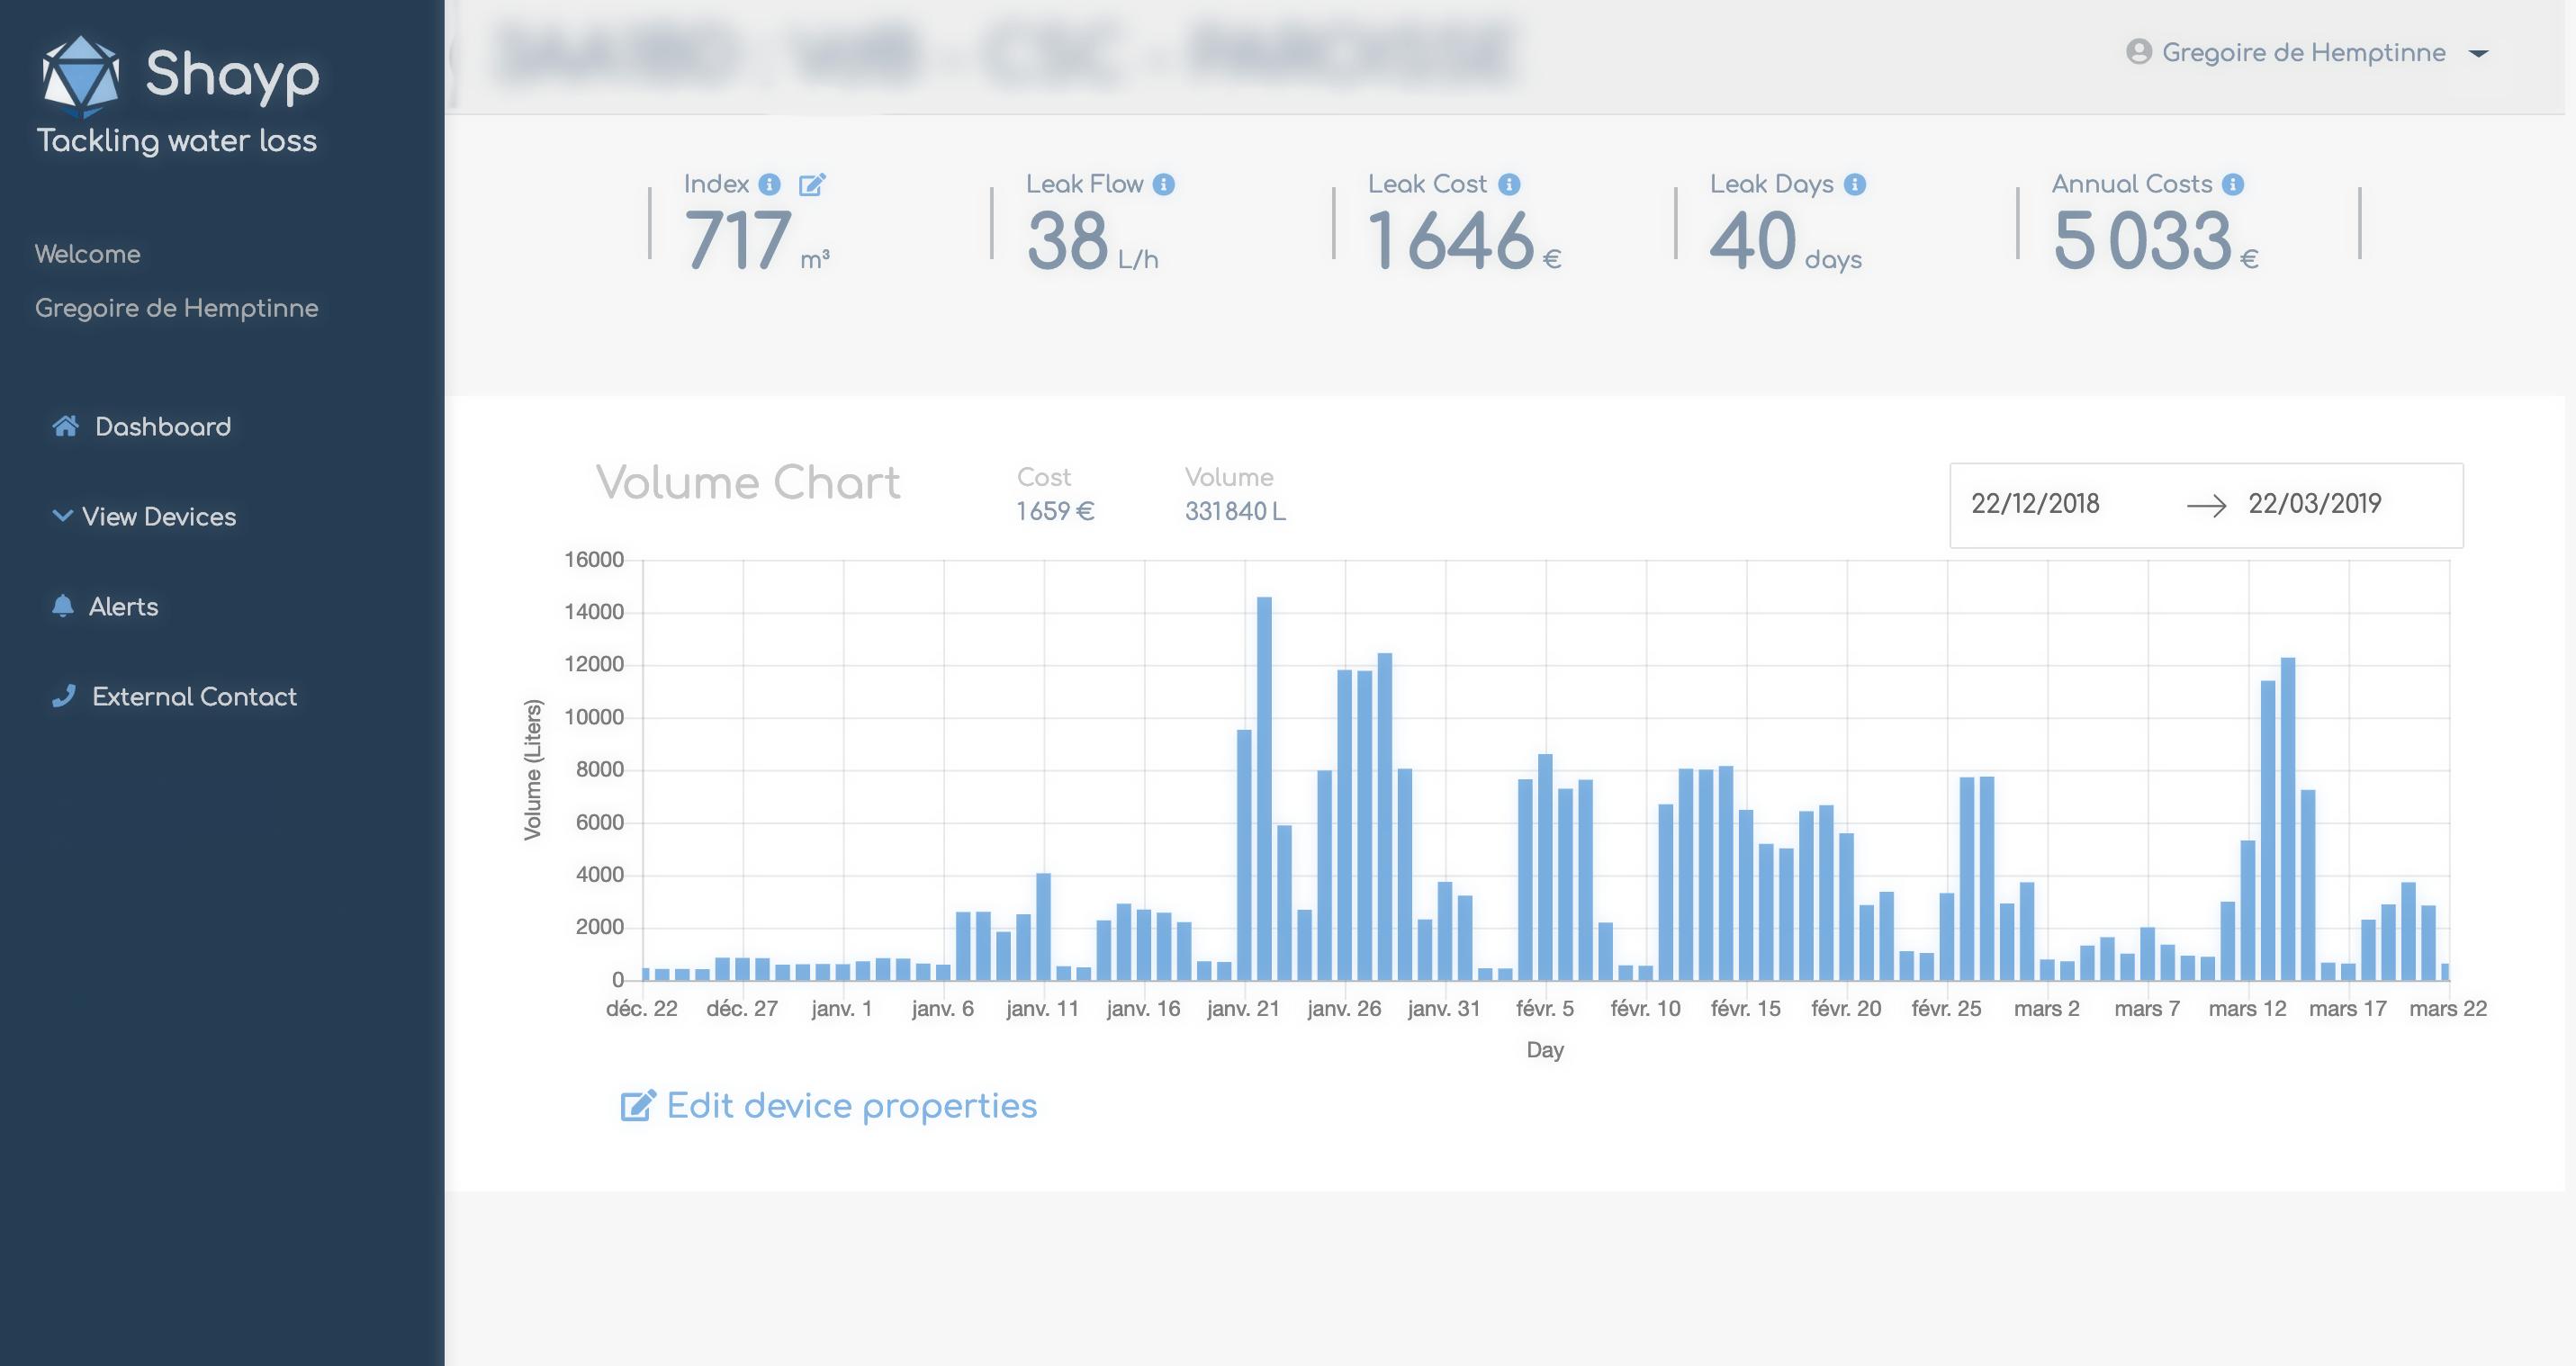 Volume Chart